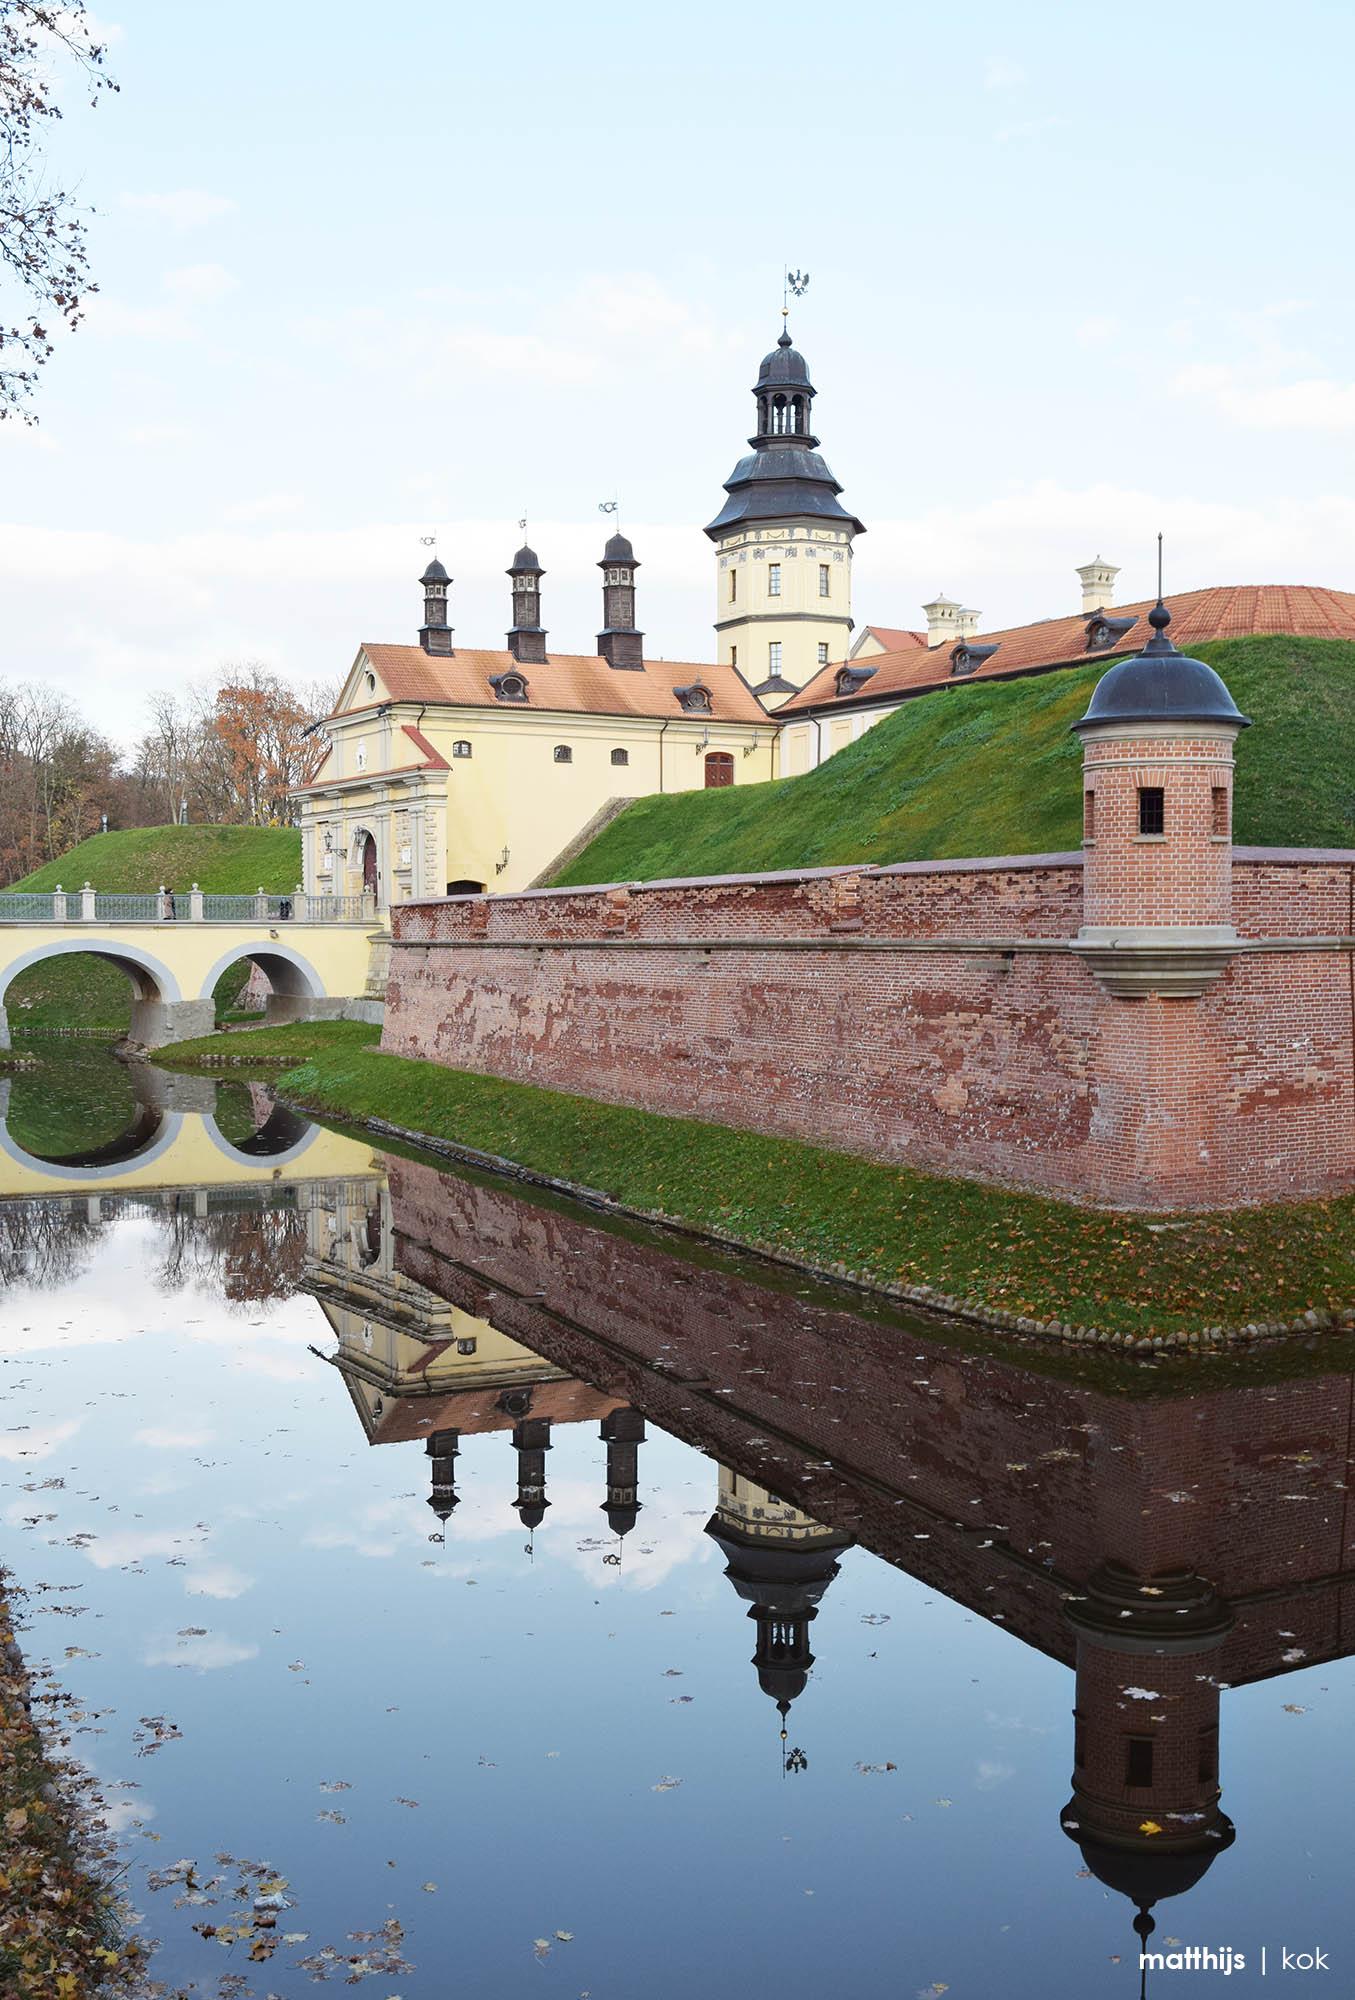 Niasviž Castle, Nesvizh, Belarus | Photo by Matthijs Kok